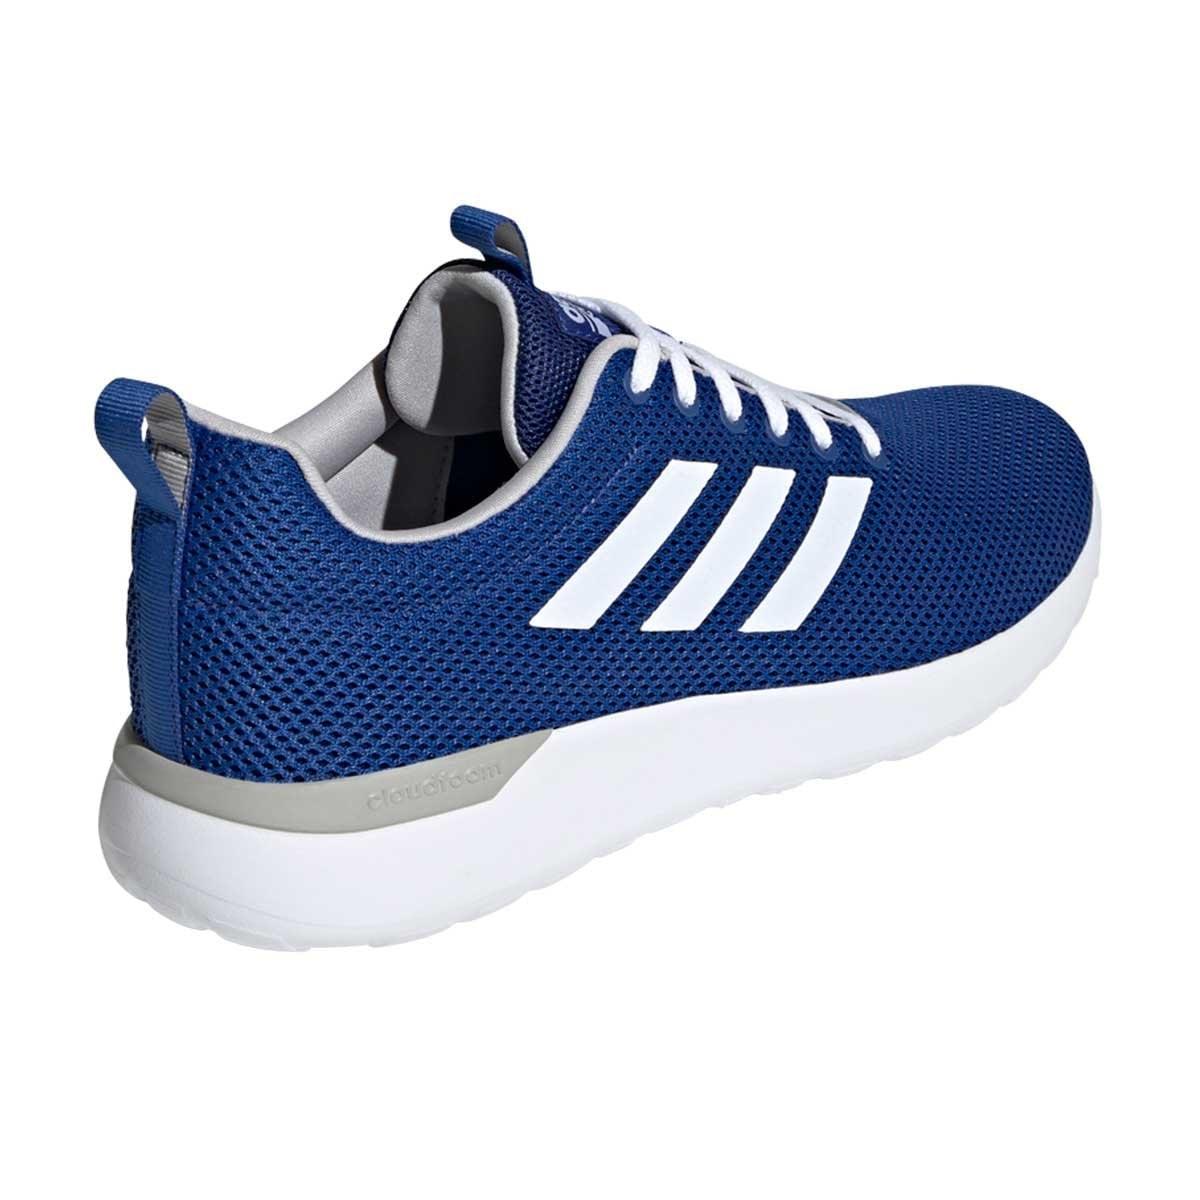 Tenis Running Lite Racer Cln Azul Adidas - Caballero